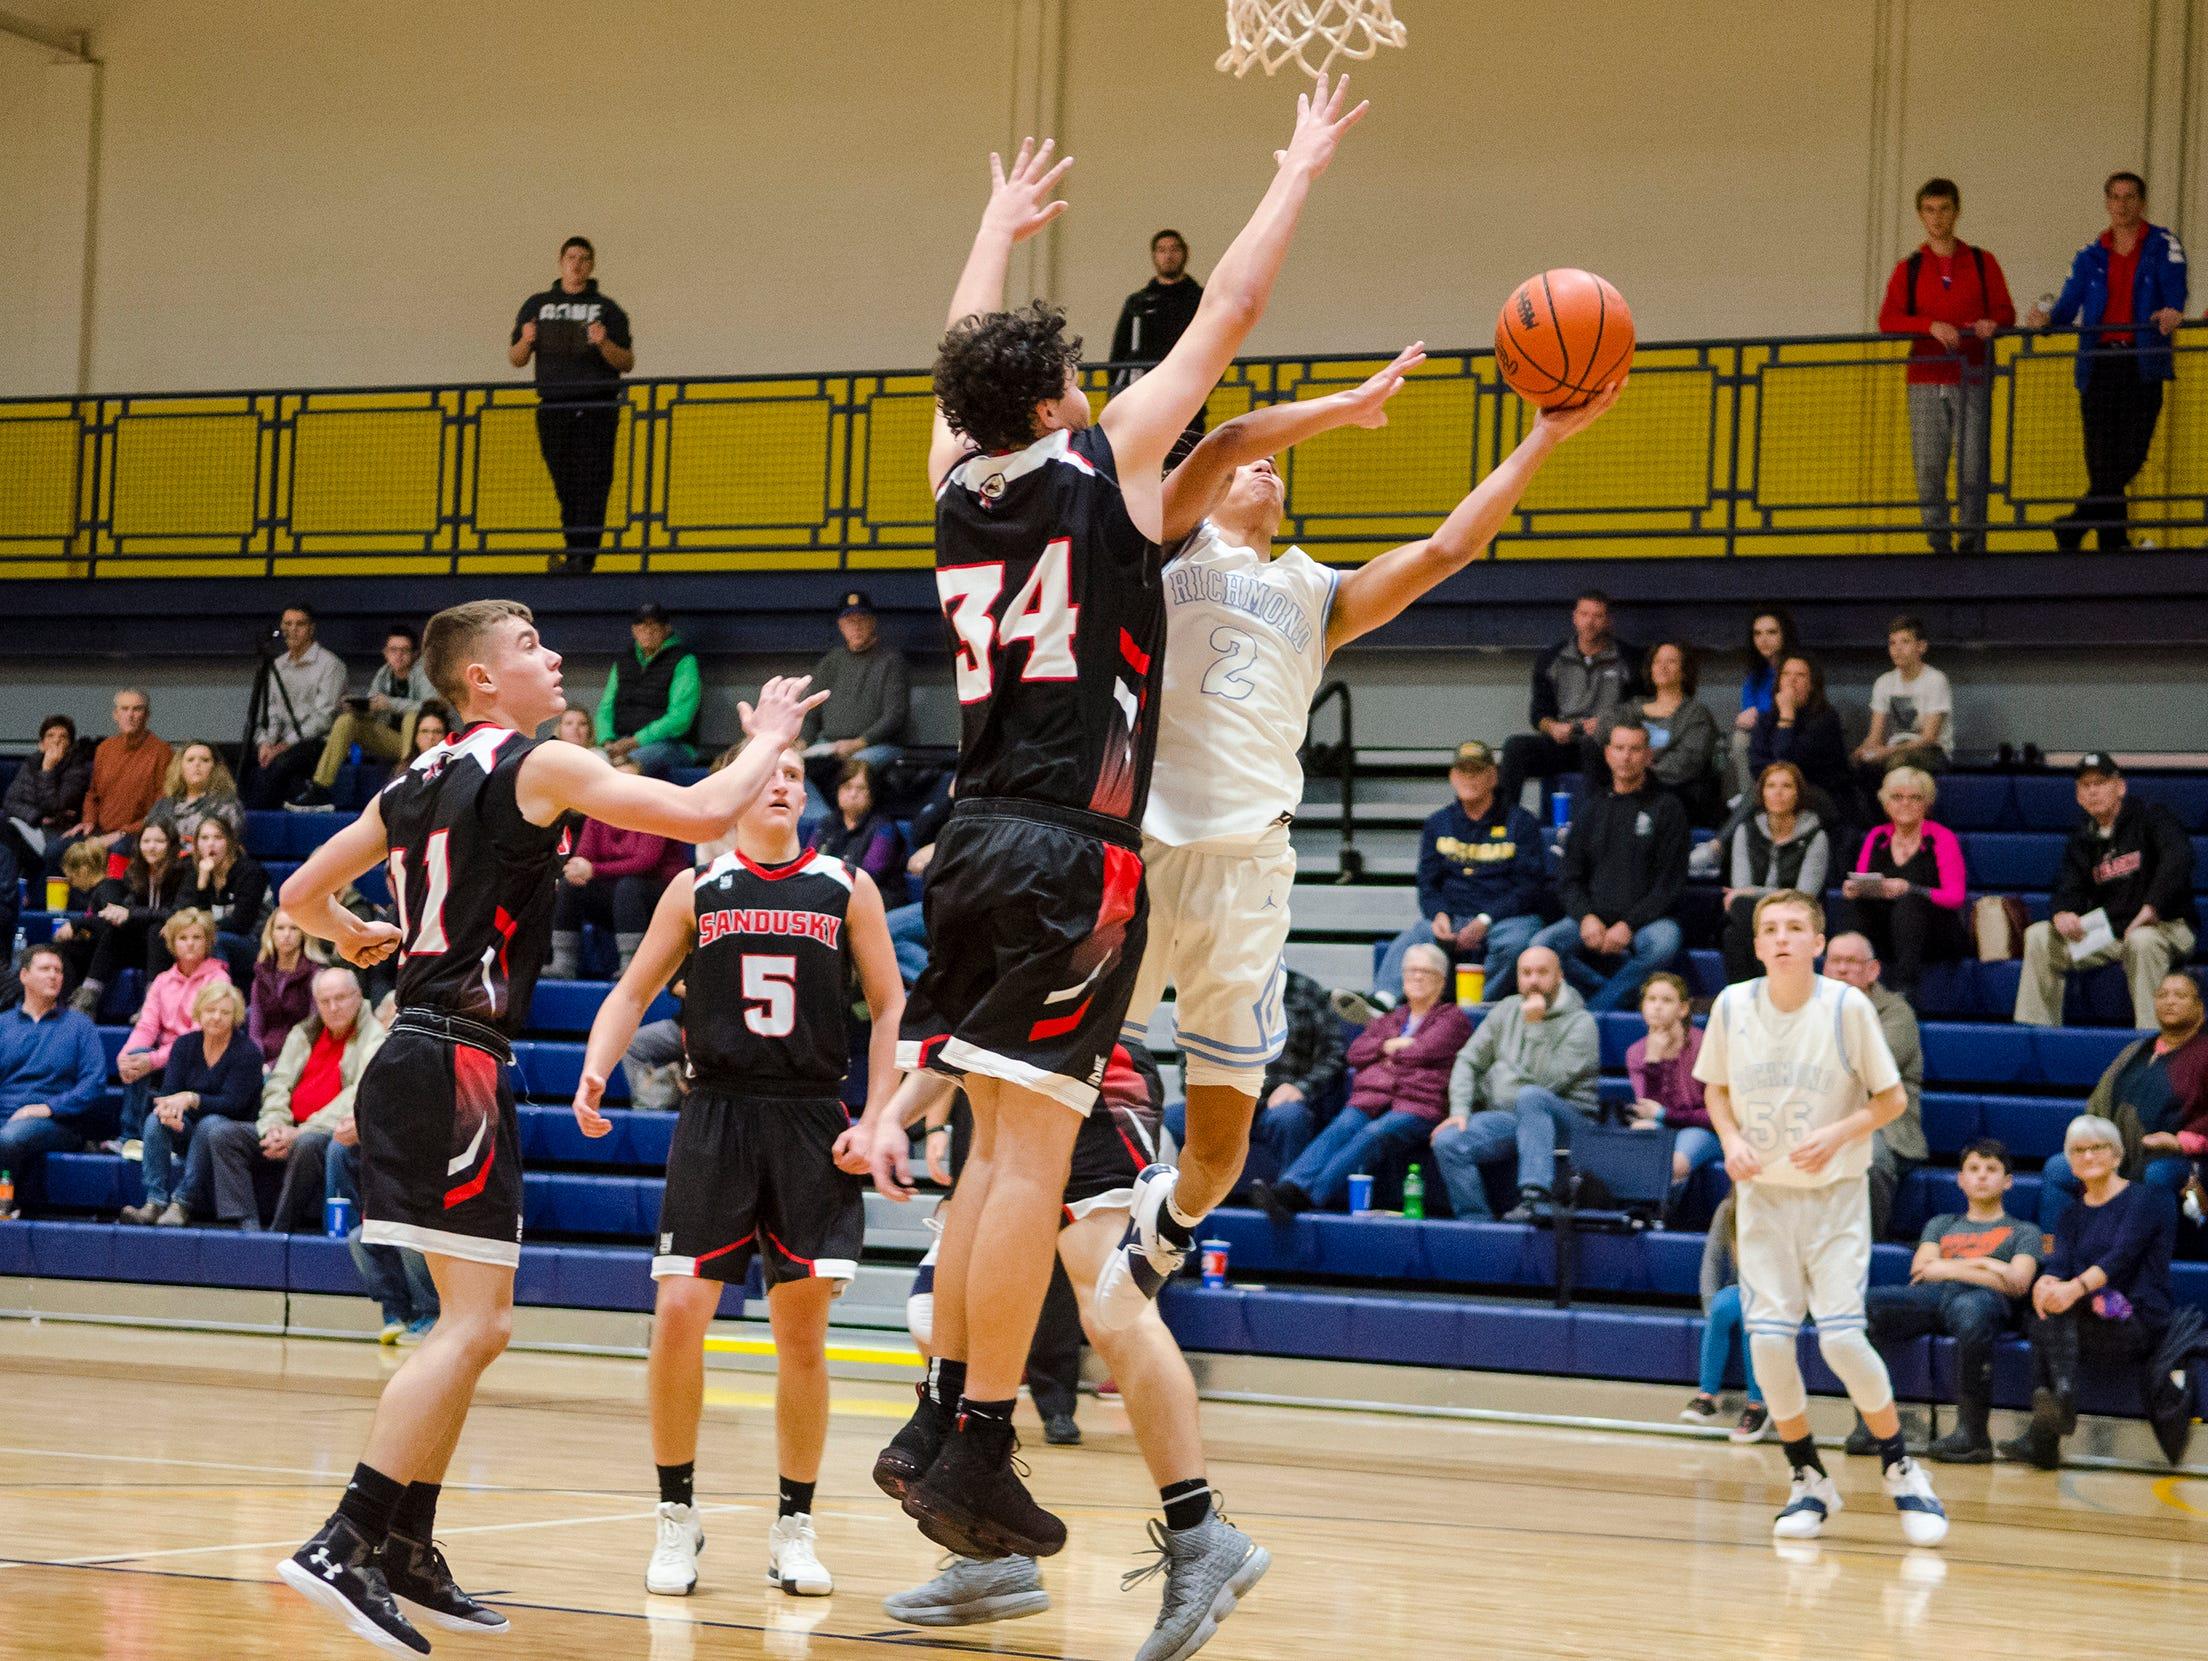 Sandusky High School forward Tyler Nelson (34) jumps to block a basket by Richmond High School guard Drew Davis during their SC4 Holiday Basketball Showcase game Friday, Dec. 28, 2018 at the SC4 Fieldhouse.